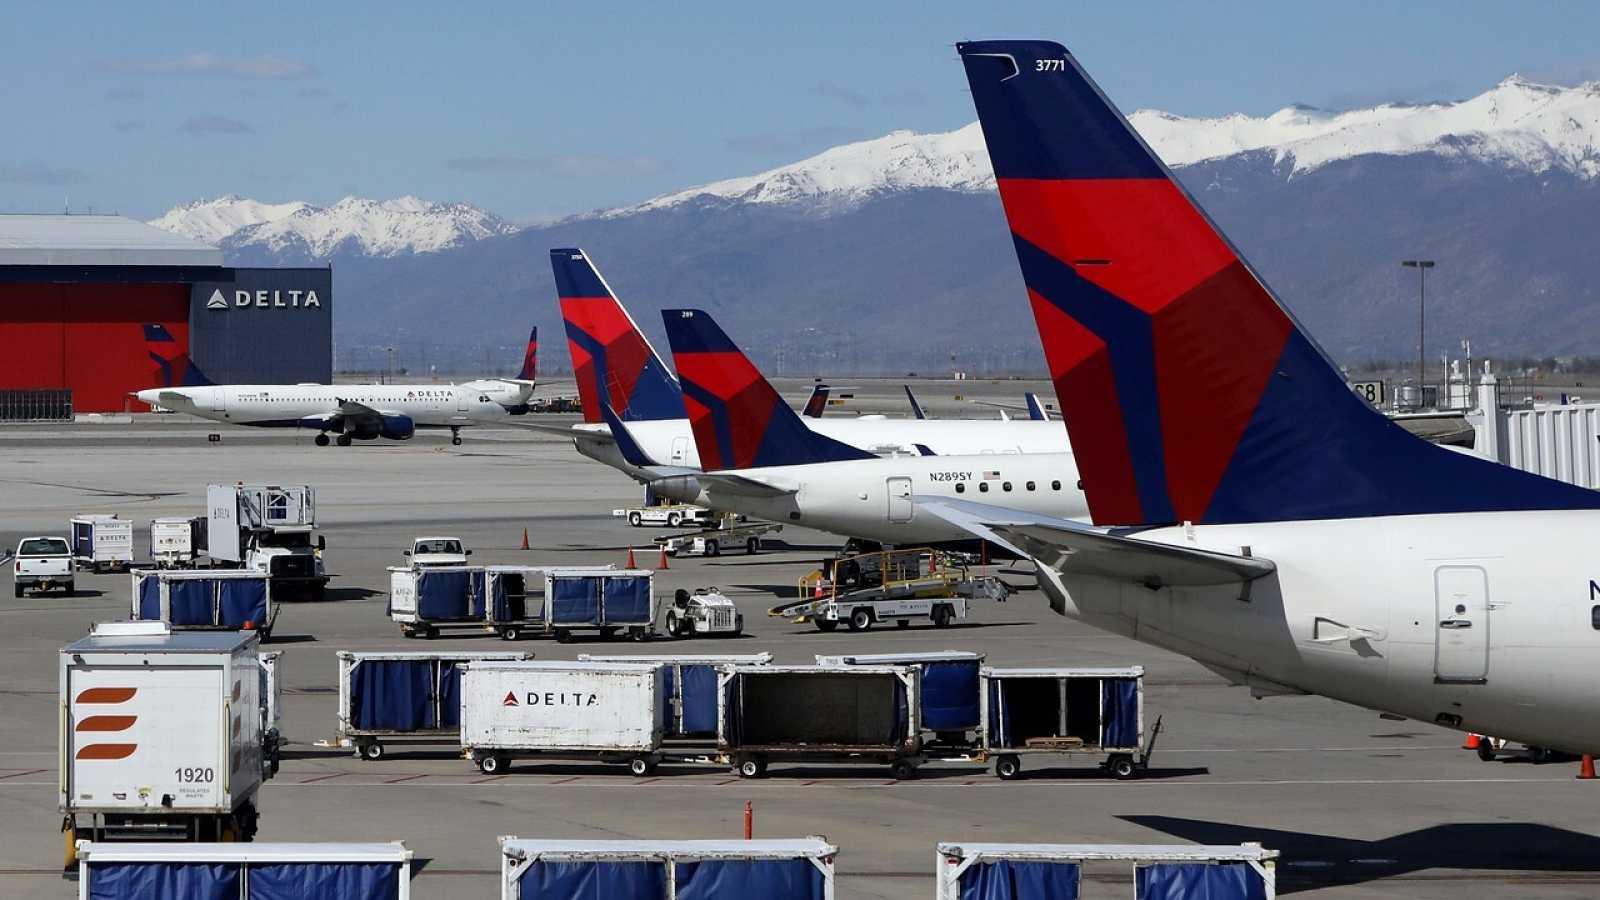 Aeropuerto Internacional de Salt Lake City, Utah